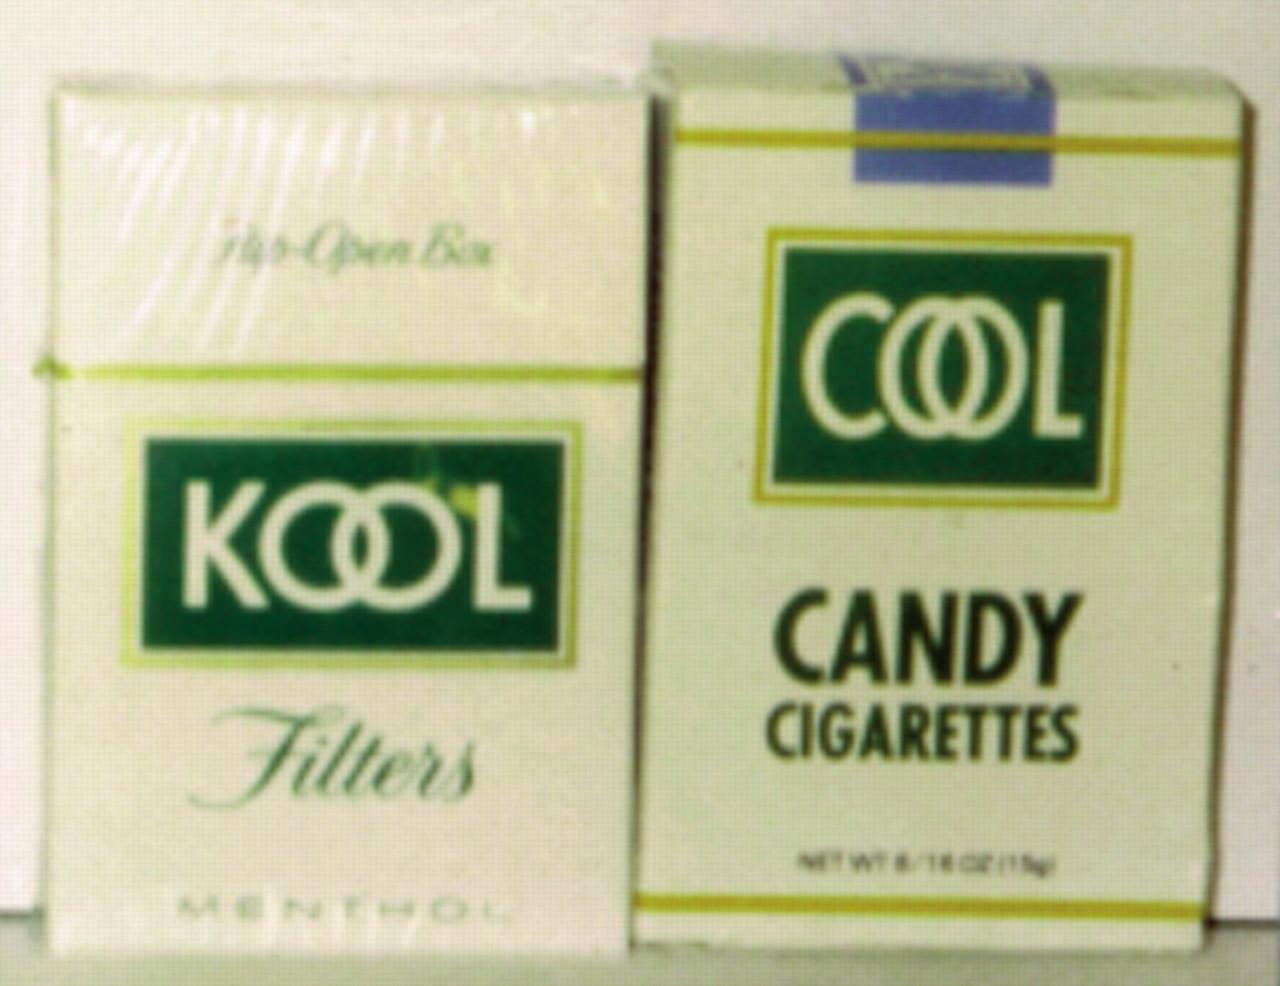 Marlboro cigarettes mail coupons